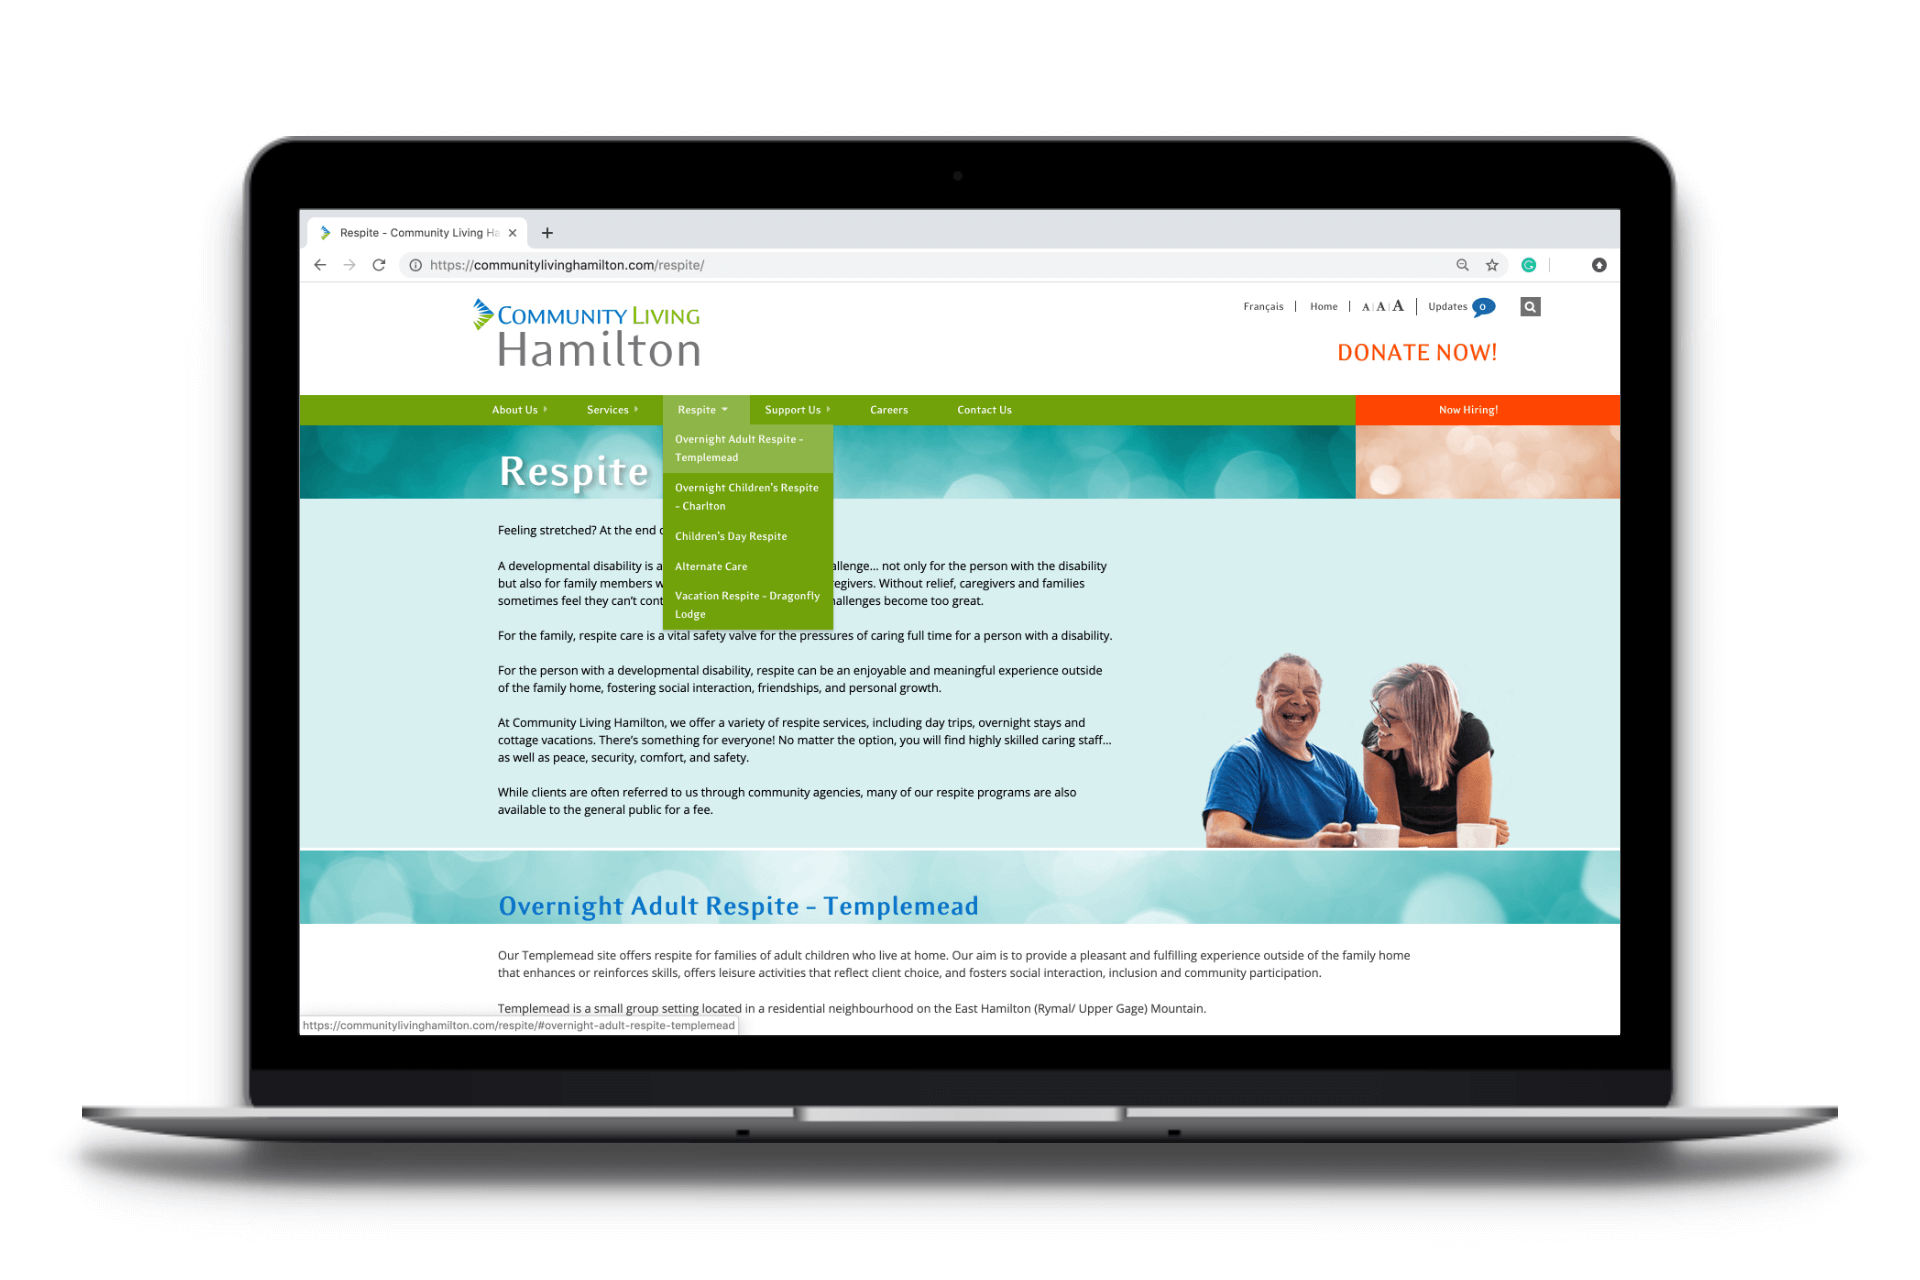 Website design for Community Living Hamilton - Respite Page